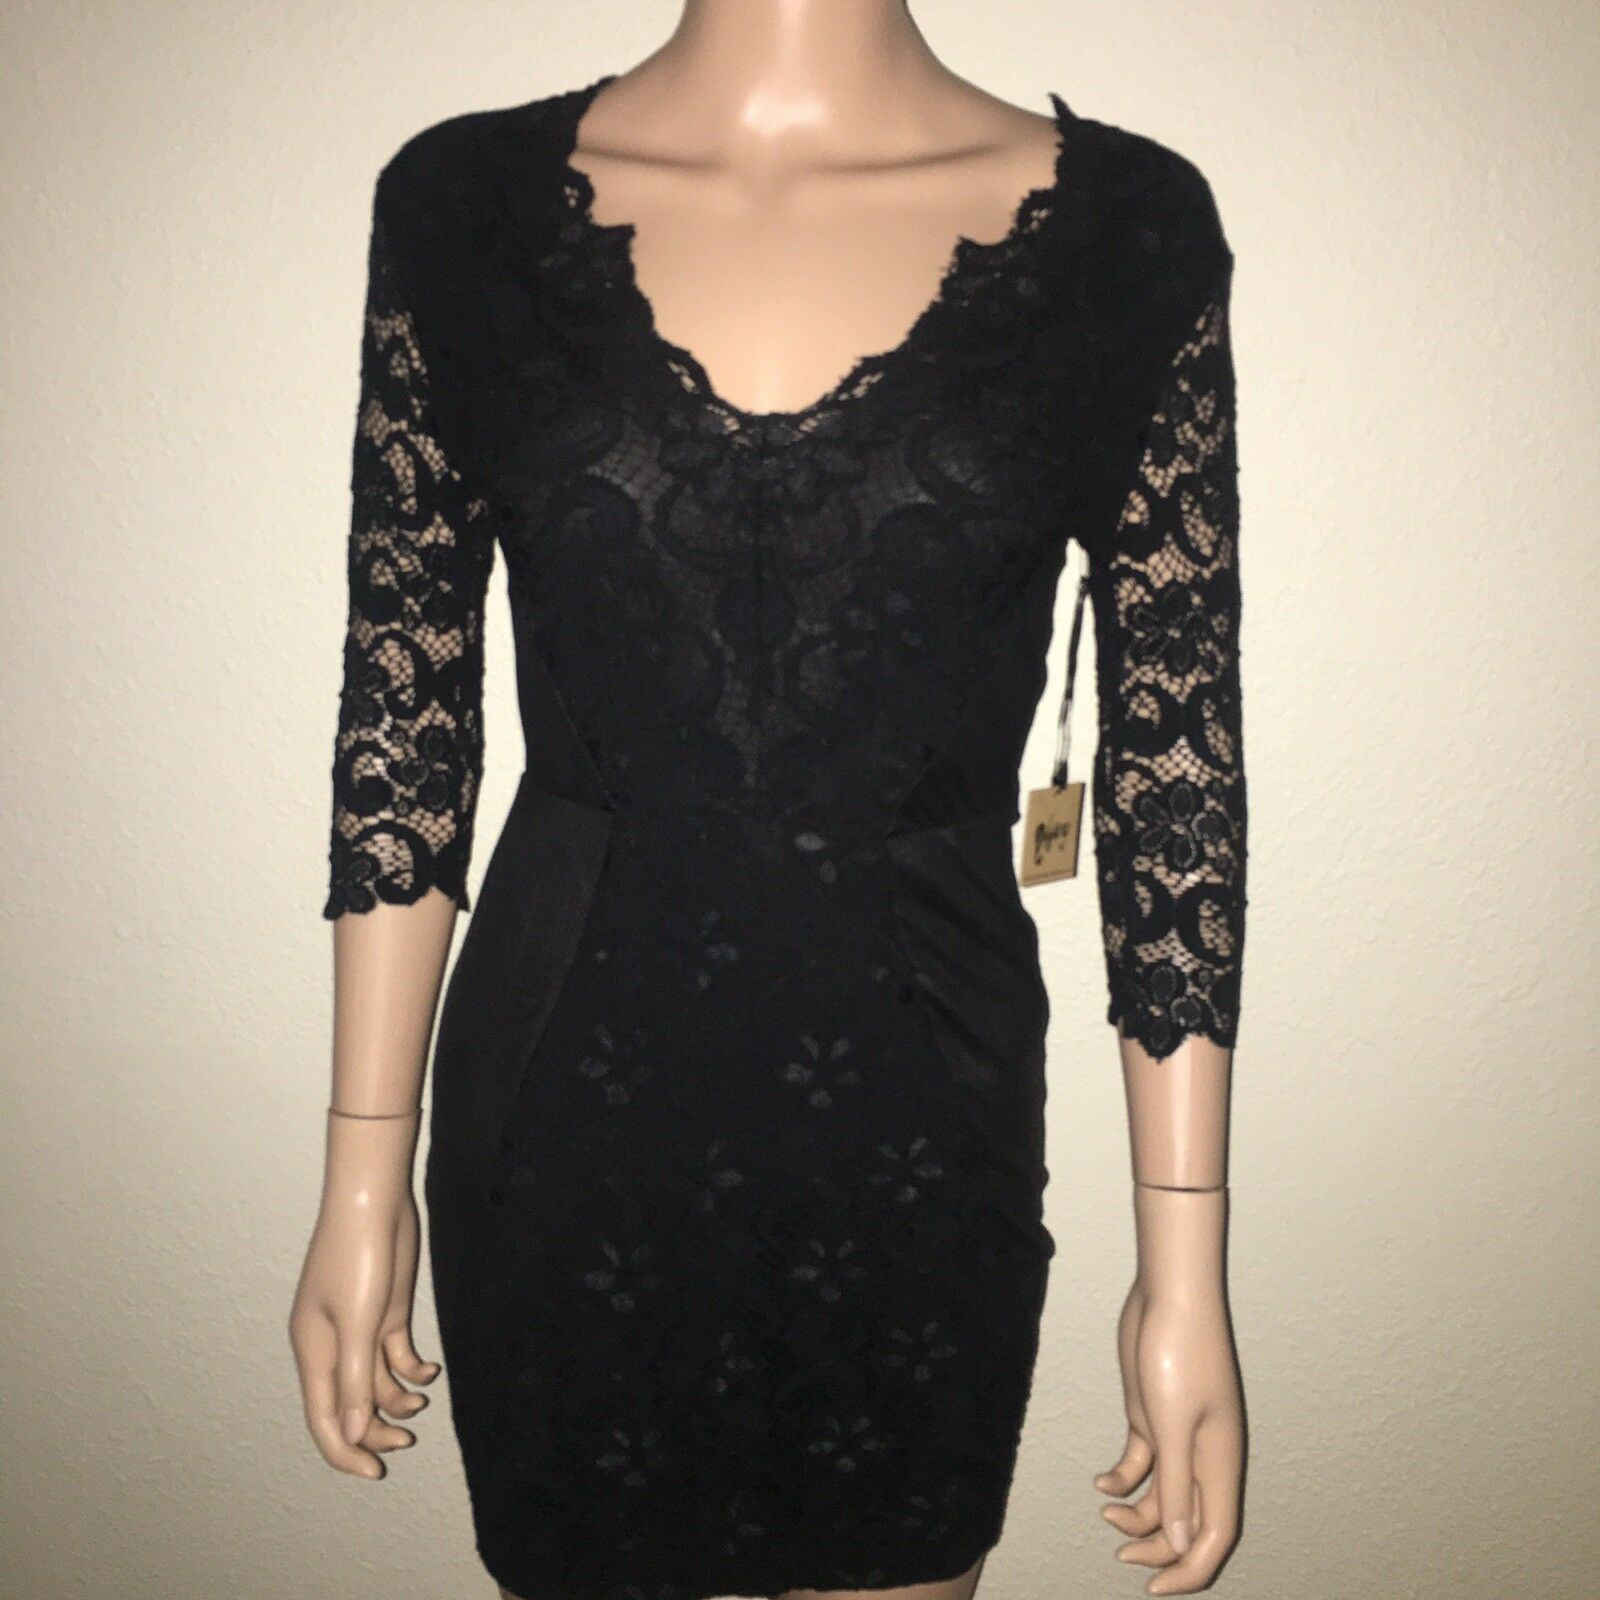 NightCap Little schwarz Lace Crochet Dress Woherren Größe 1 New